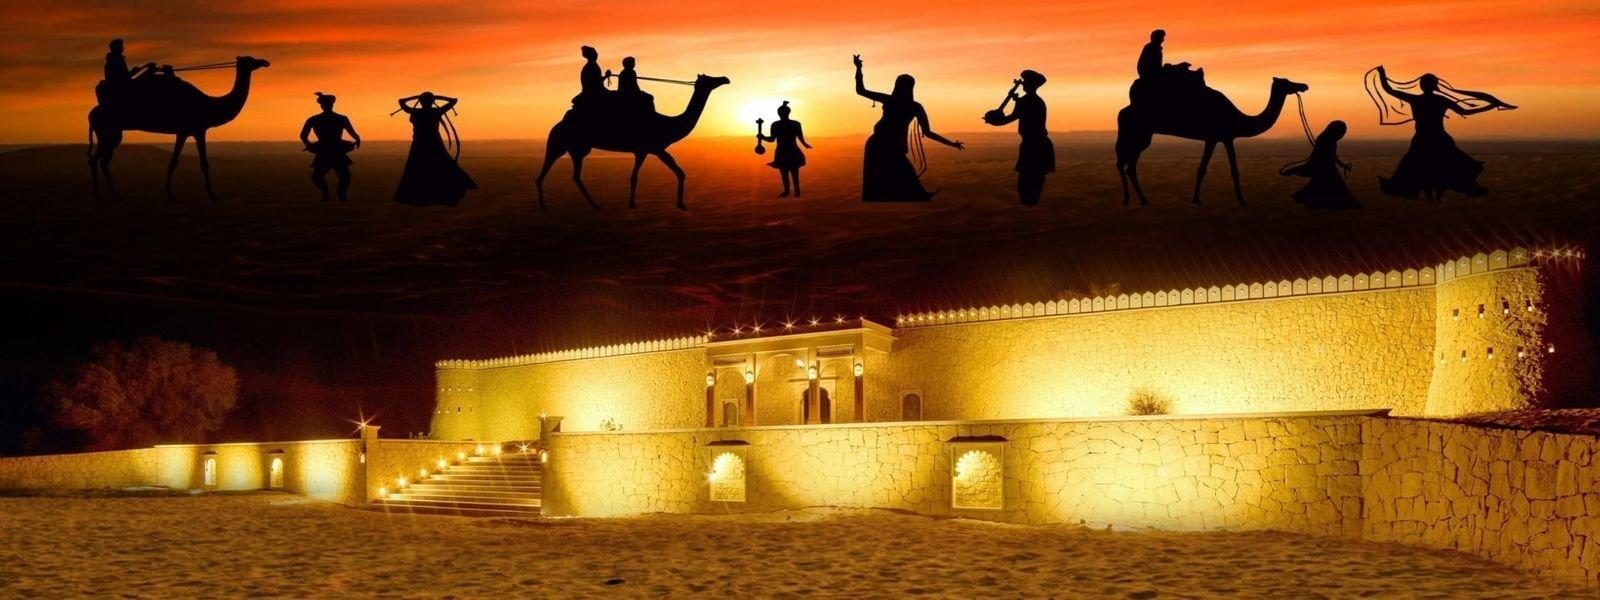 Jaisalmer Desert Safari: with Swiss Tent Stay - Tour